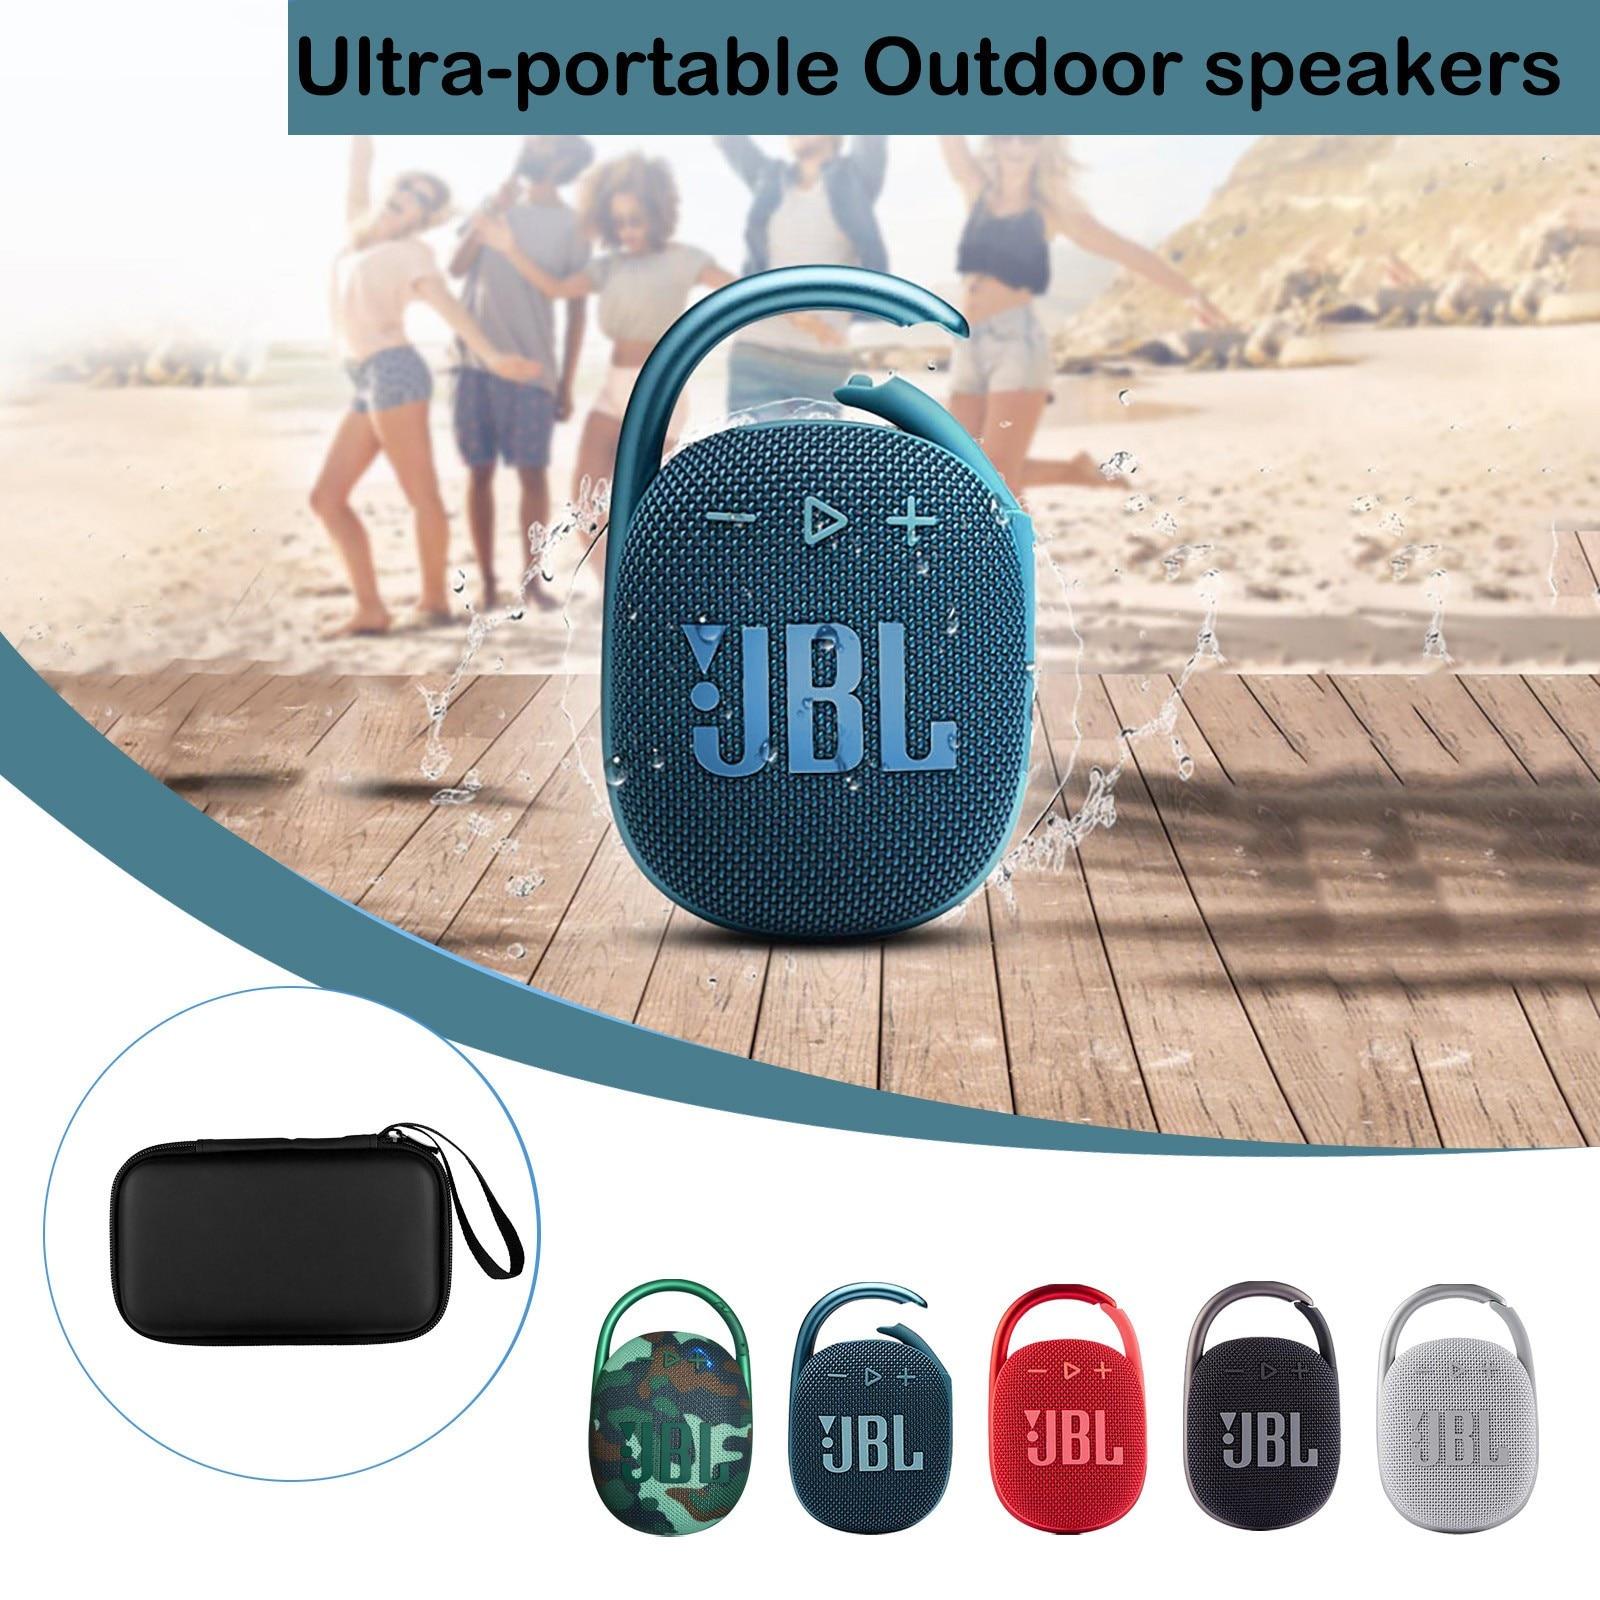 Clip4 inalámbrica Bluetooth Mini portátil Ip67 altavoces exteriores impermeables 100%-altavoces Inalámbricos Con...